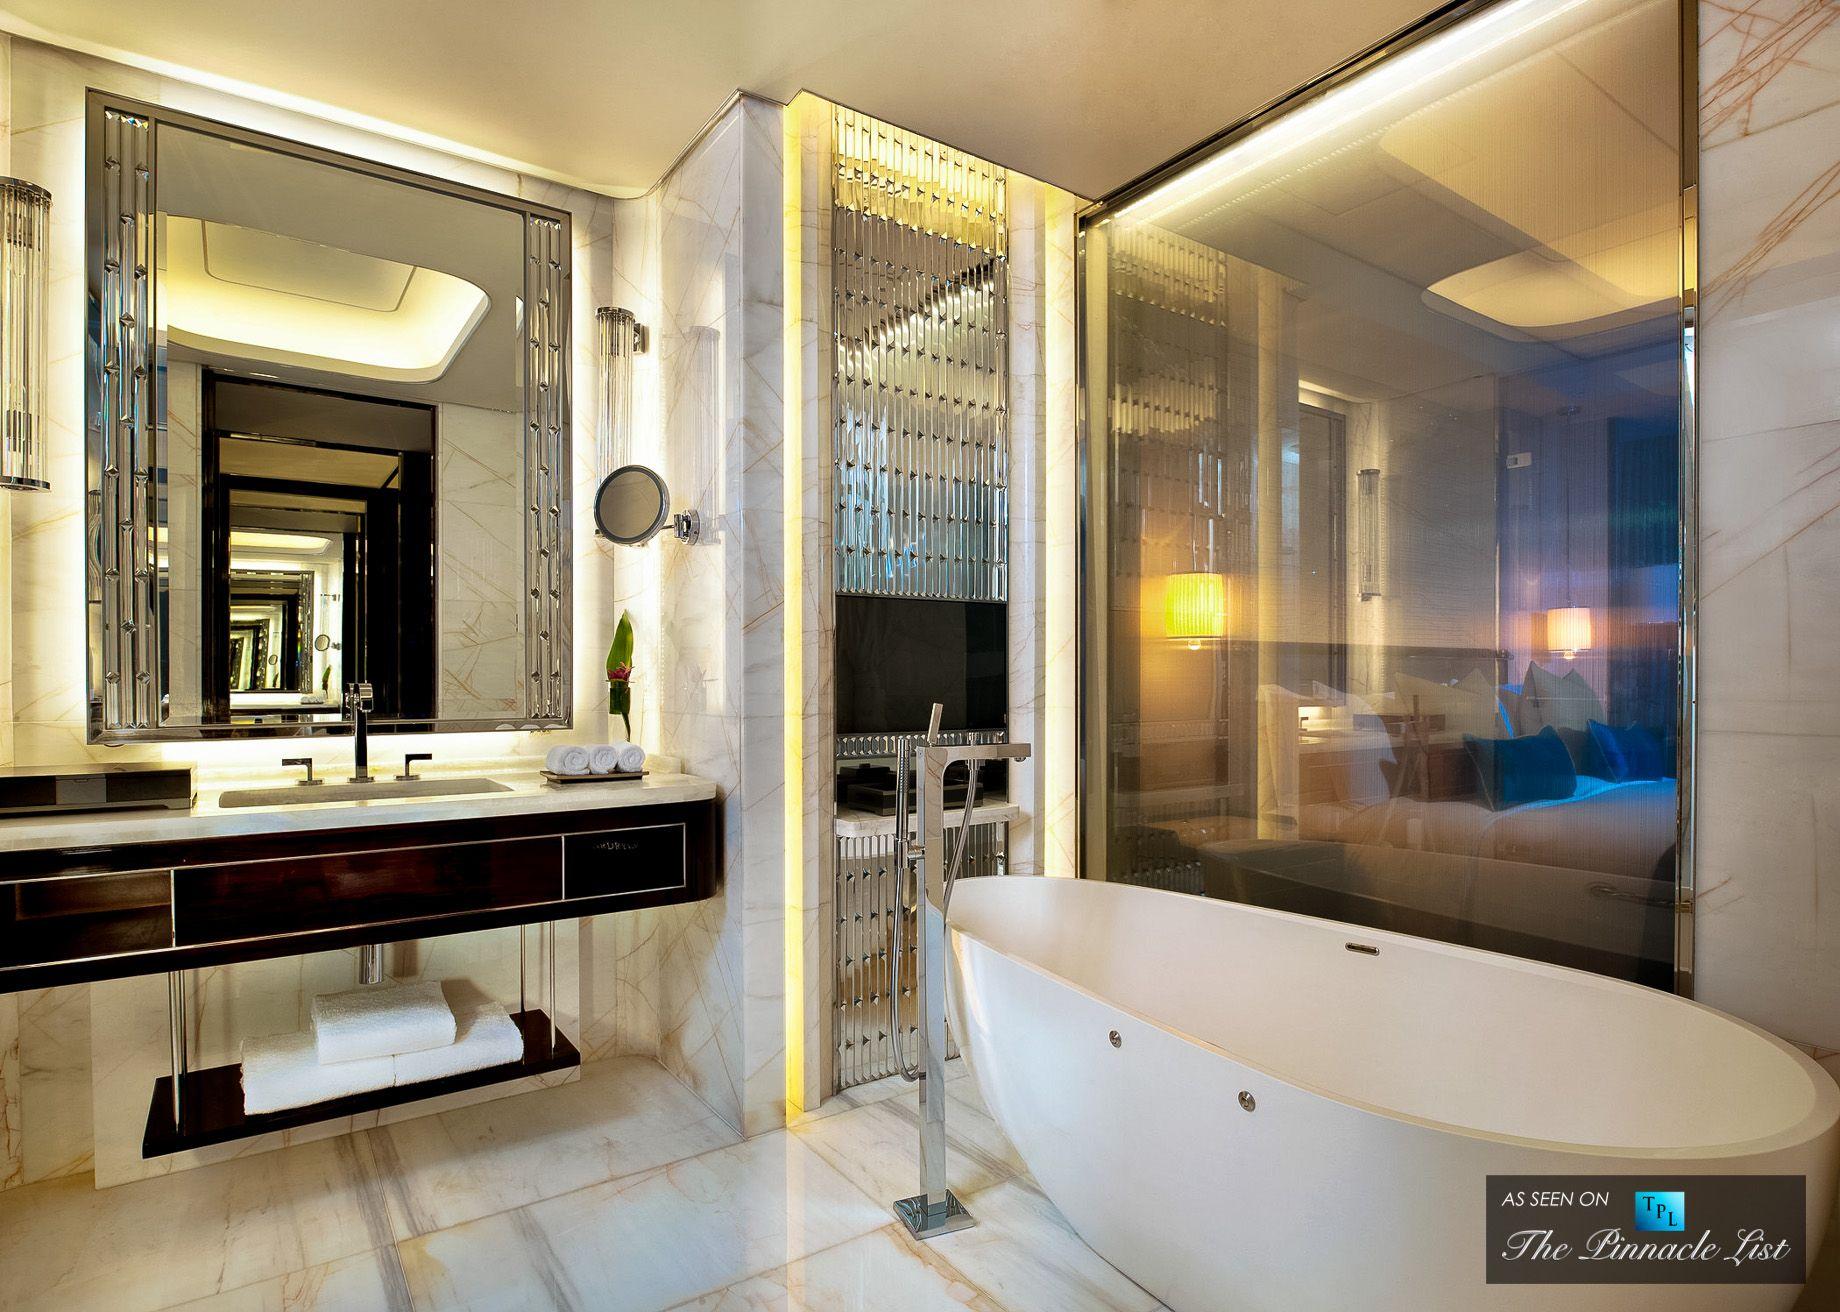 Best 25 luxury hotel bathroom ideas on pinterest hotel bathroom design hotel bathrooms and hotel paris 13